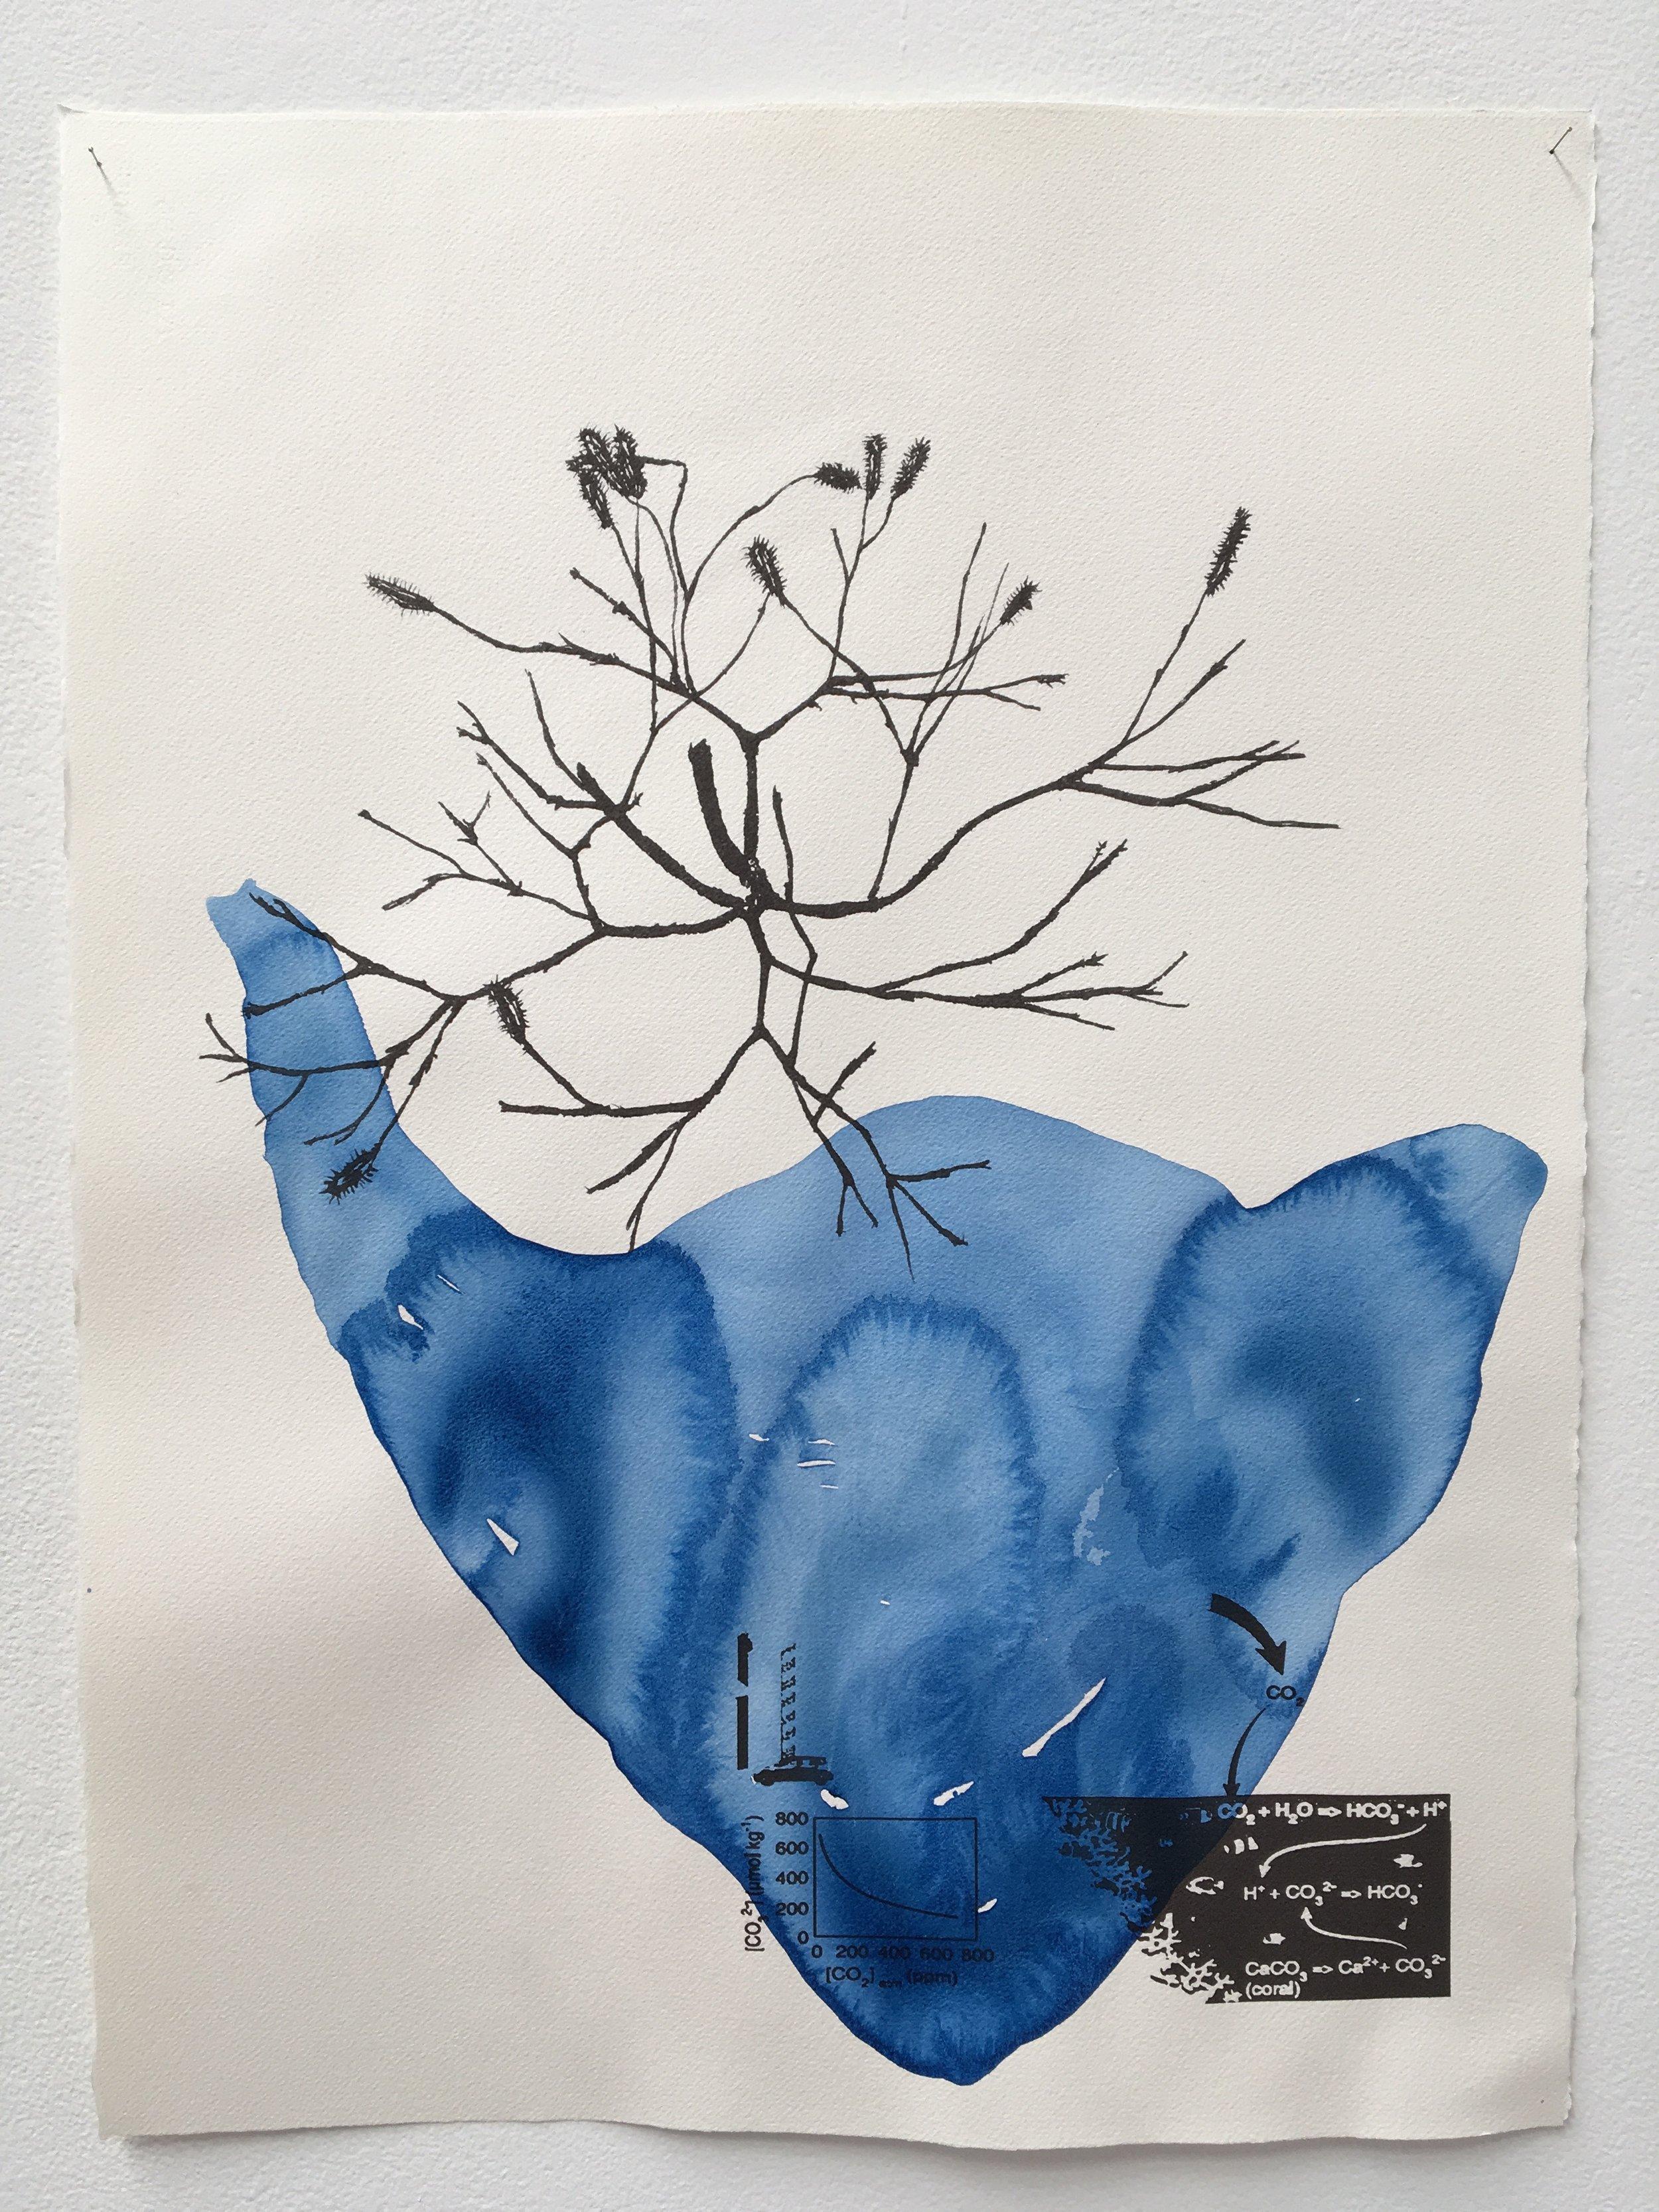 Judy Watson heron island 11 2009-16 acrylic and digital print on paper 77 x 57 cm.jpg